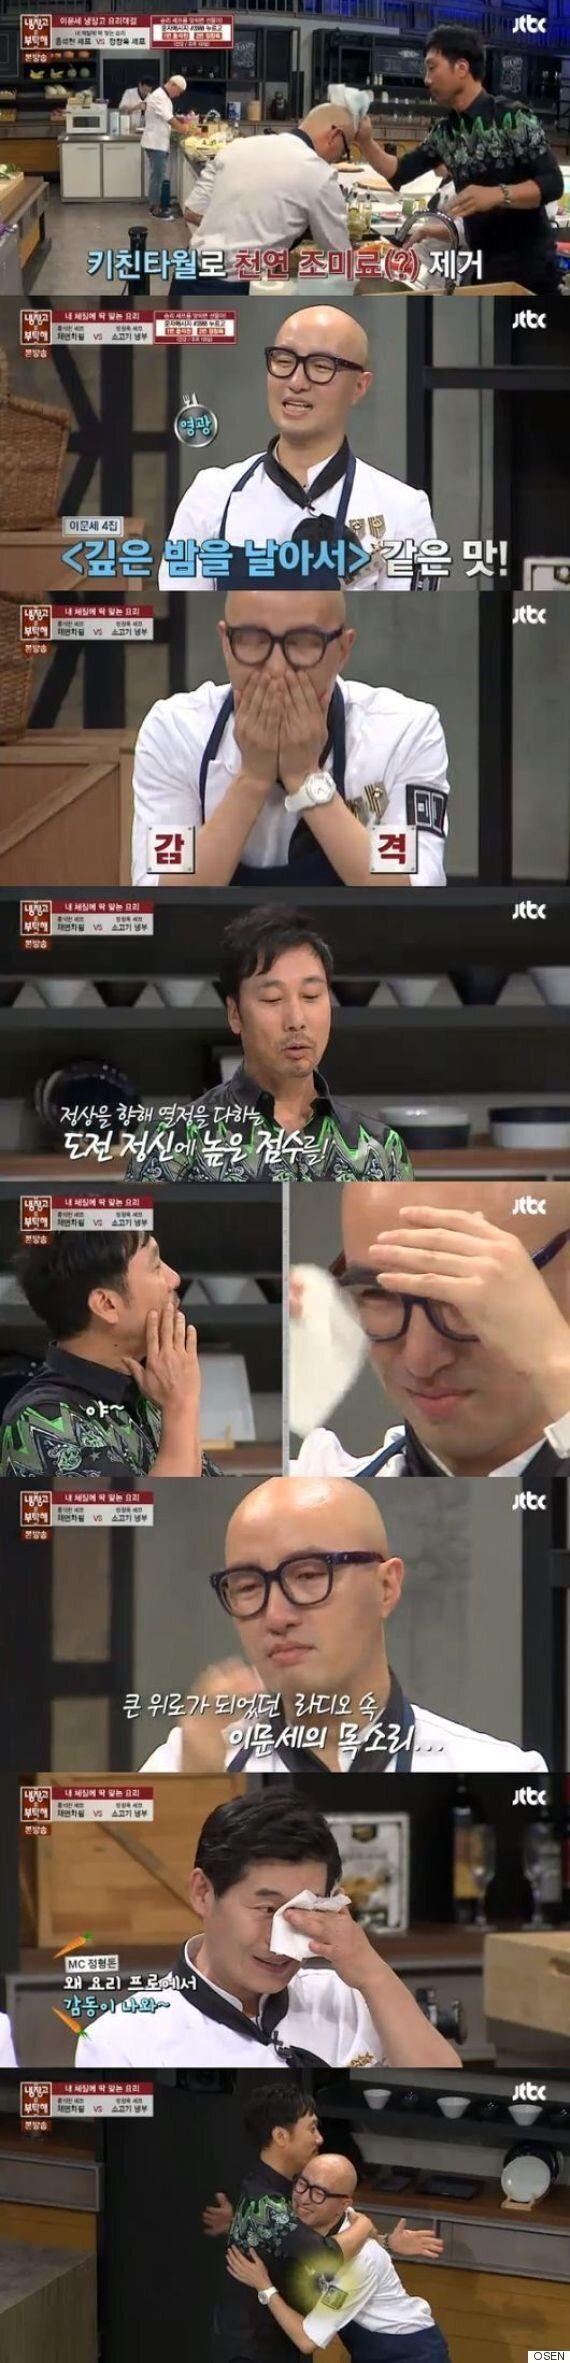 [TV어게인] '냉장고' 홍석천·이문세, 감동 한 스푼 더한